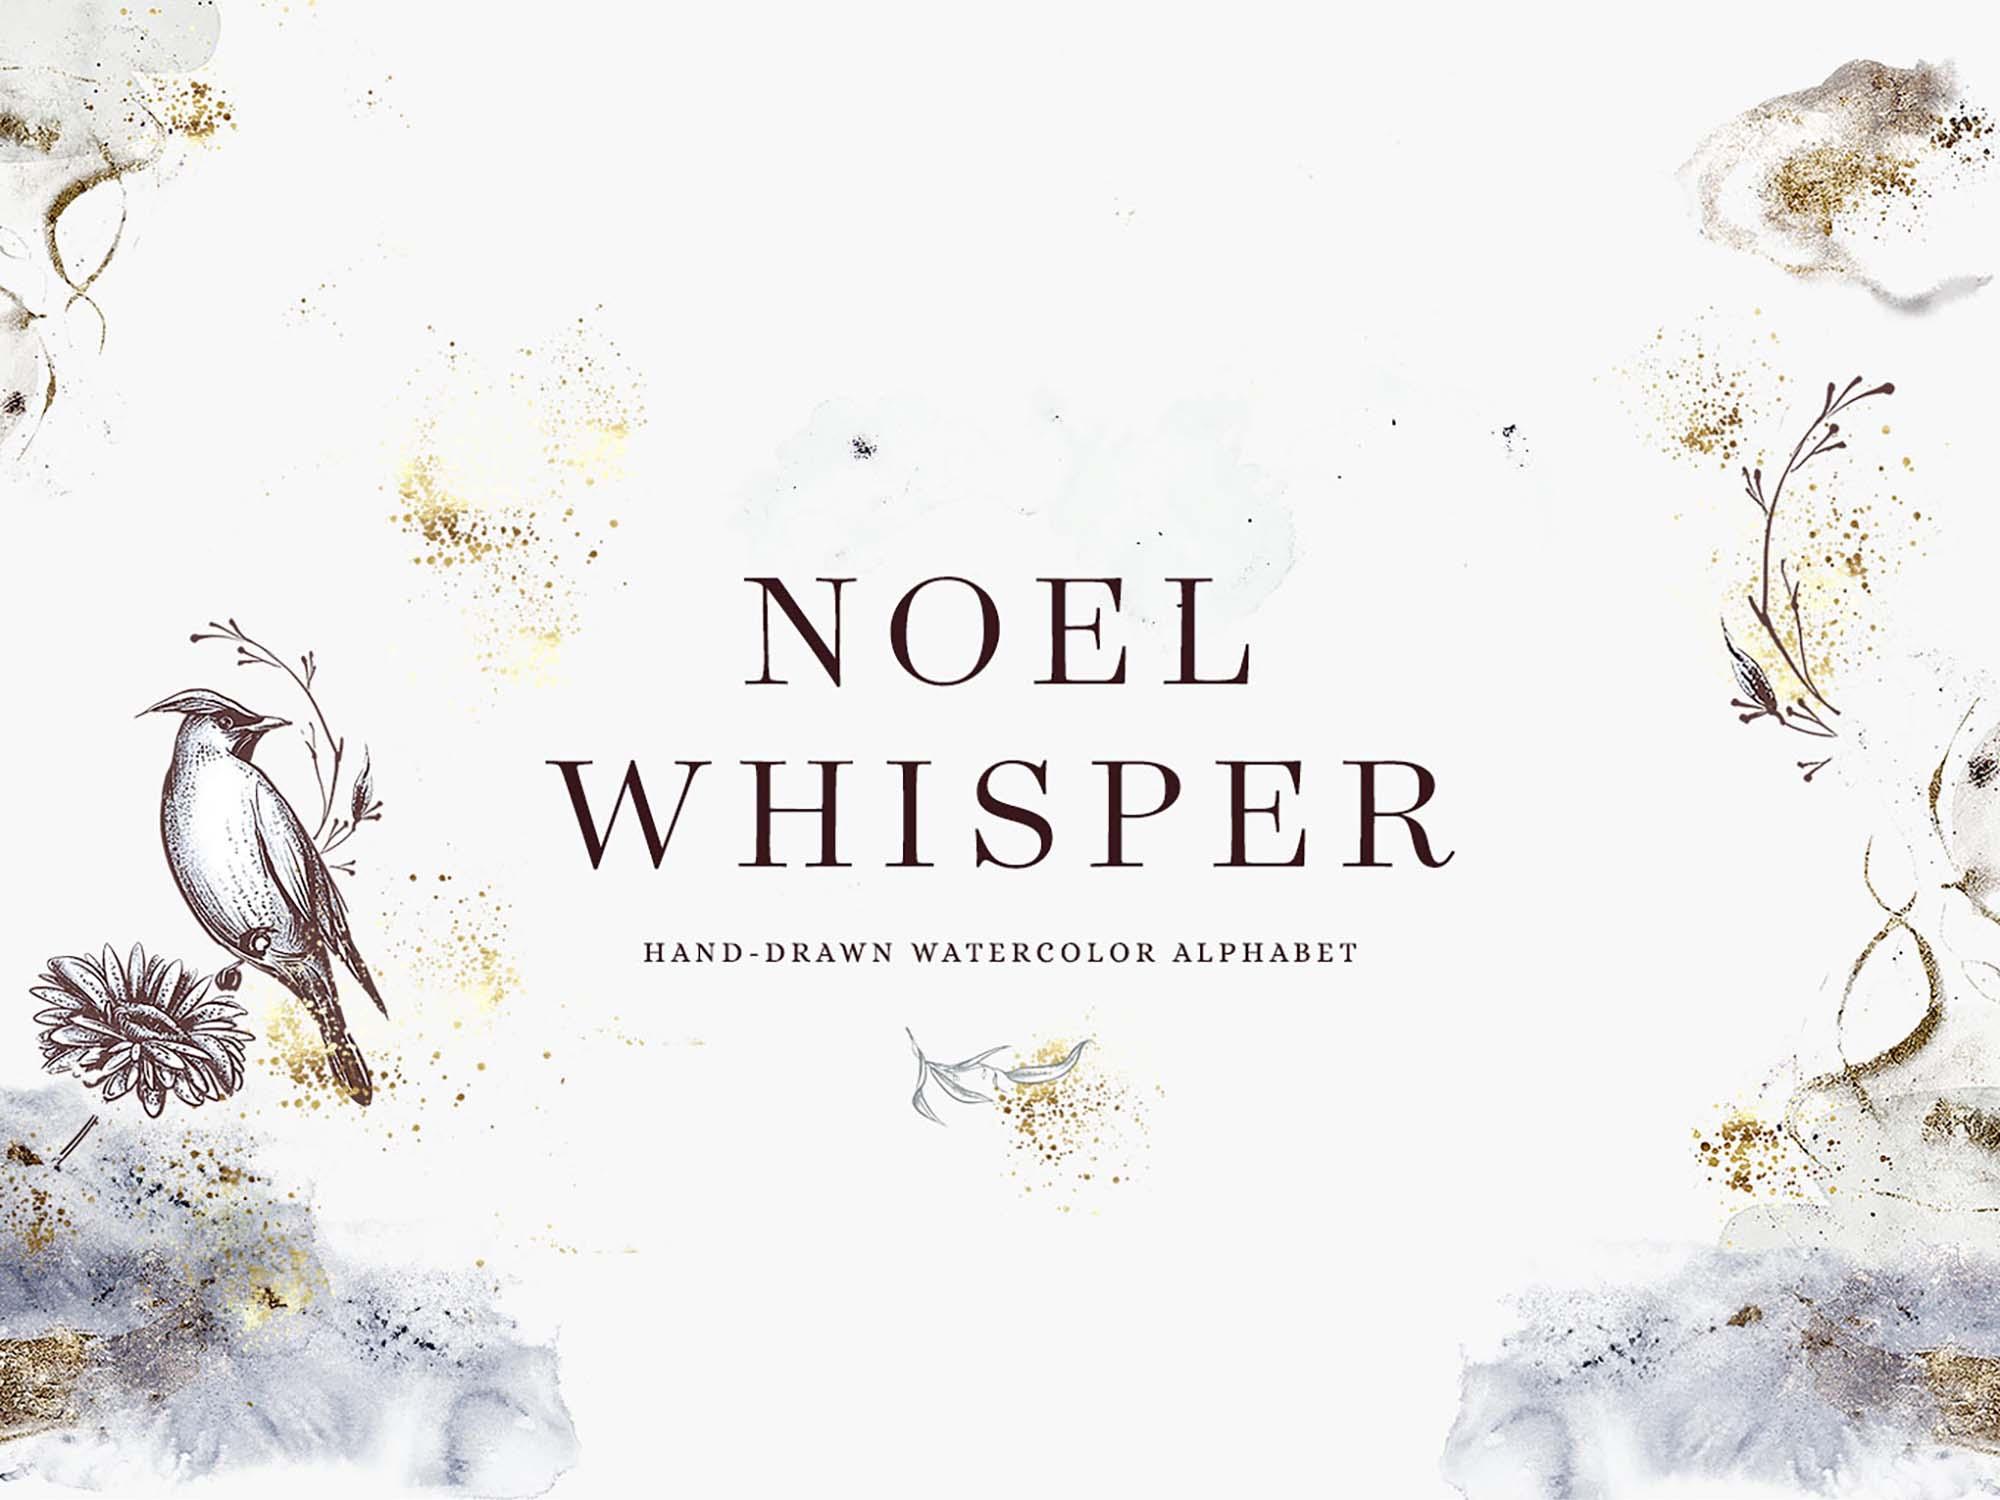 Noel Whisper Watercolor Alphabets